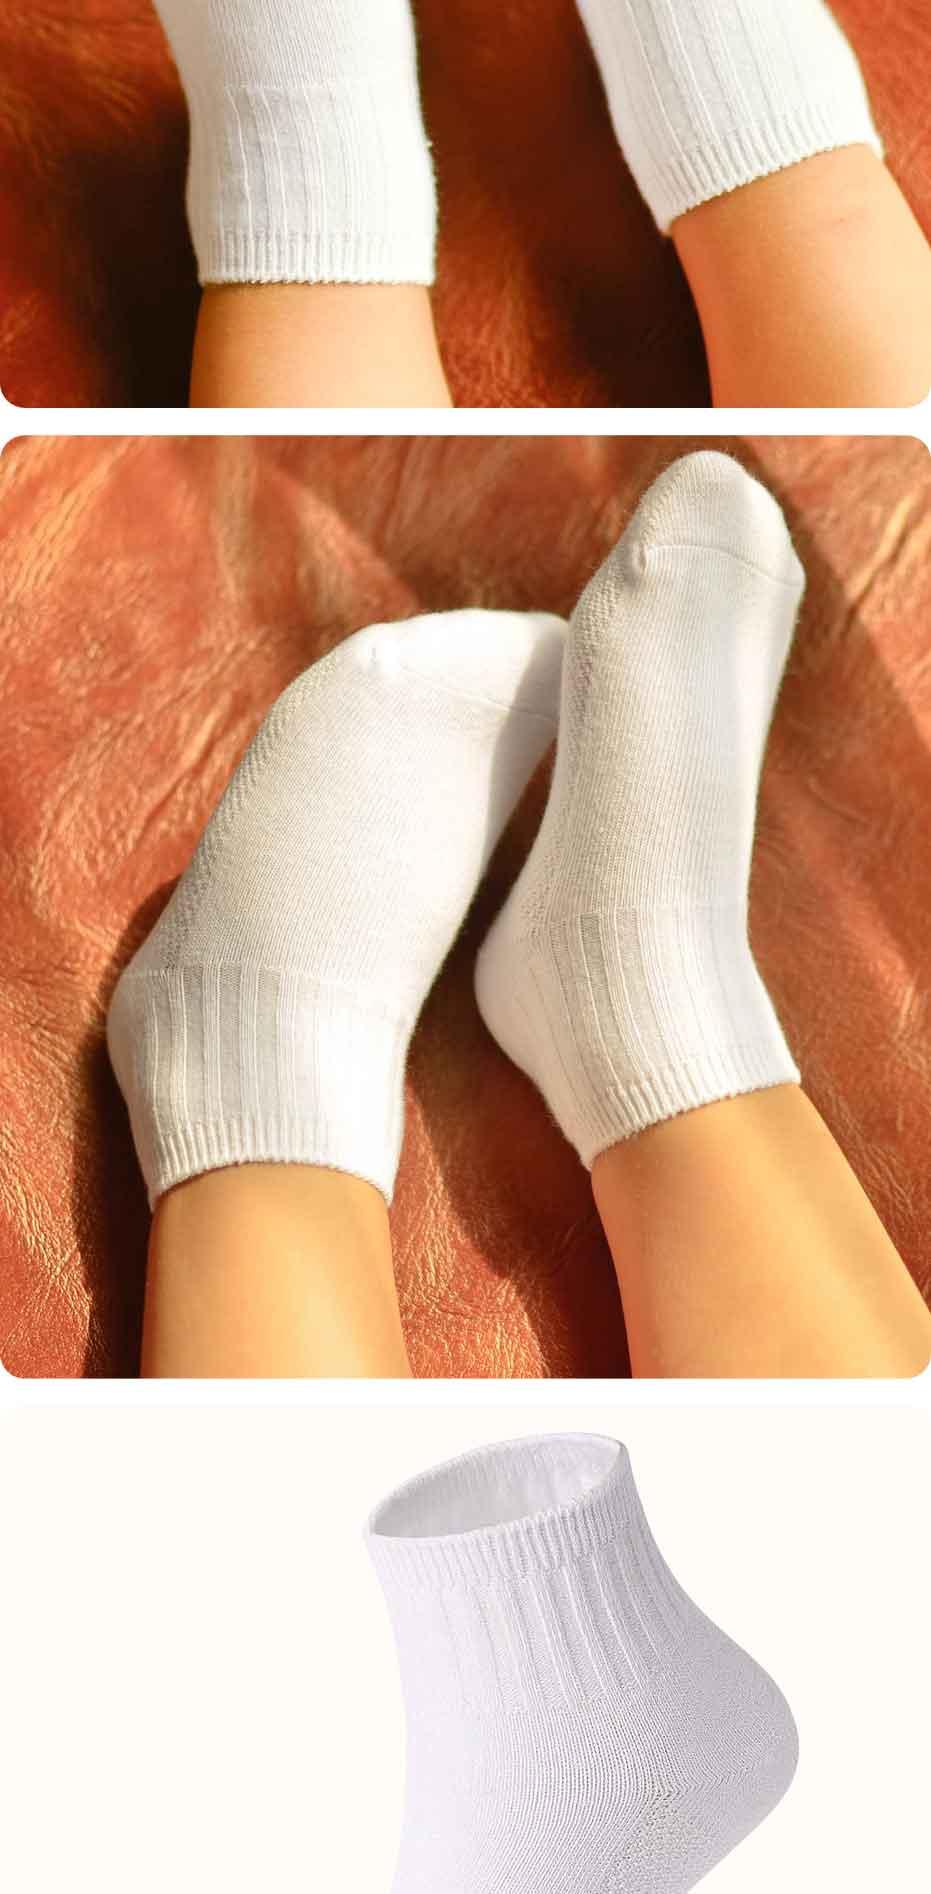 Double-needle-socks-description_04